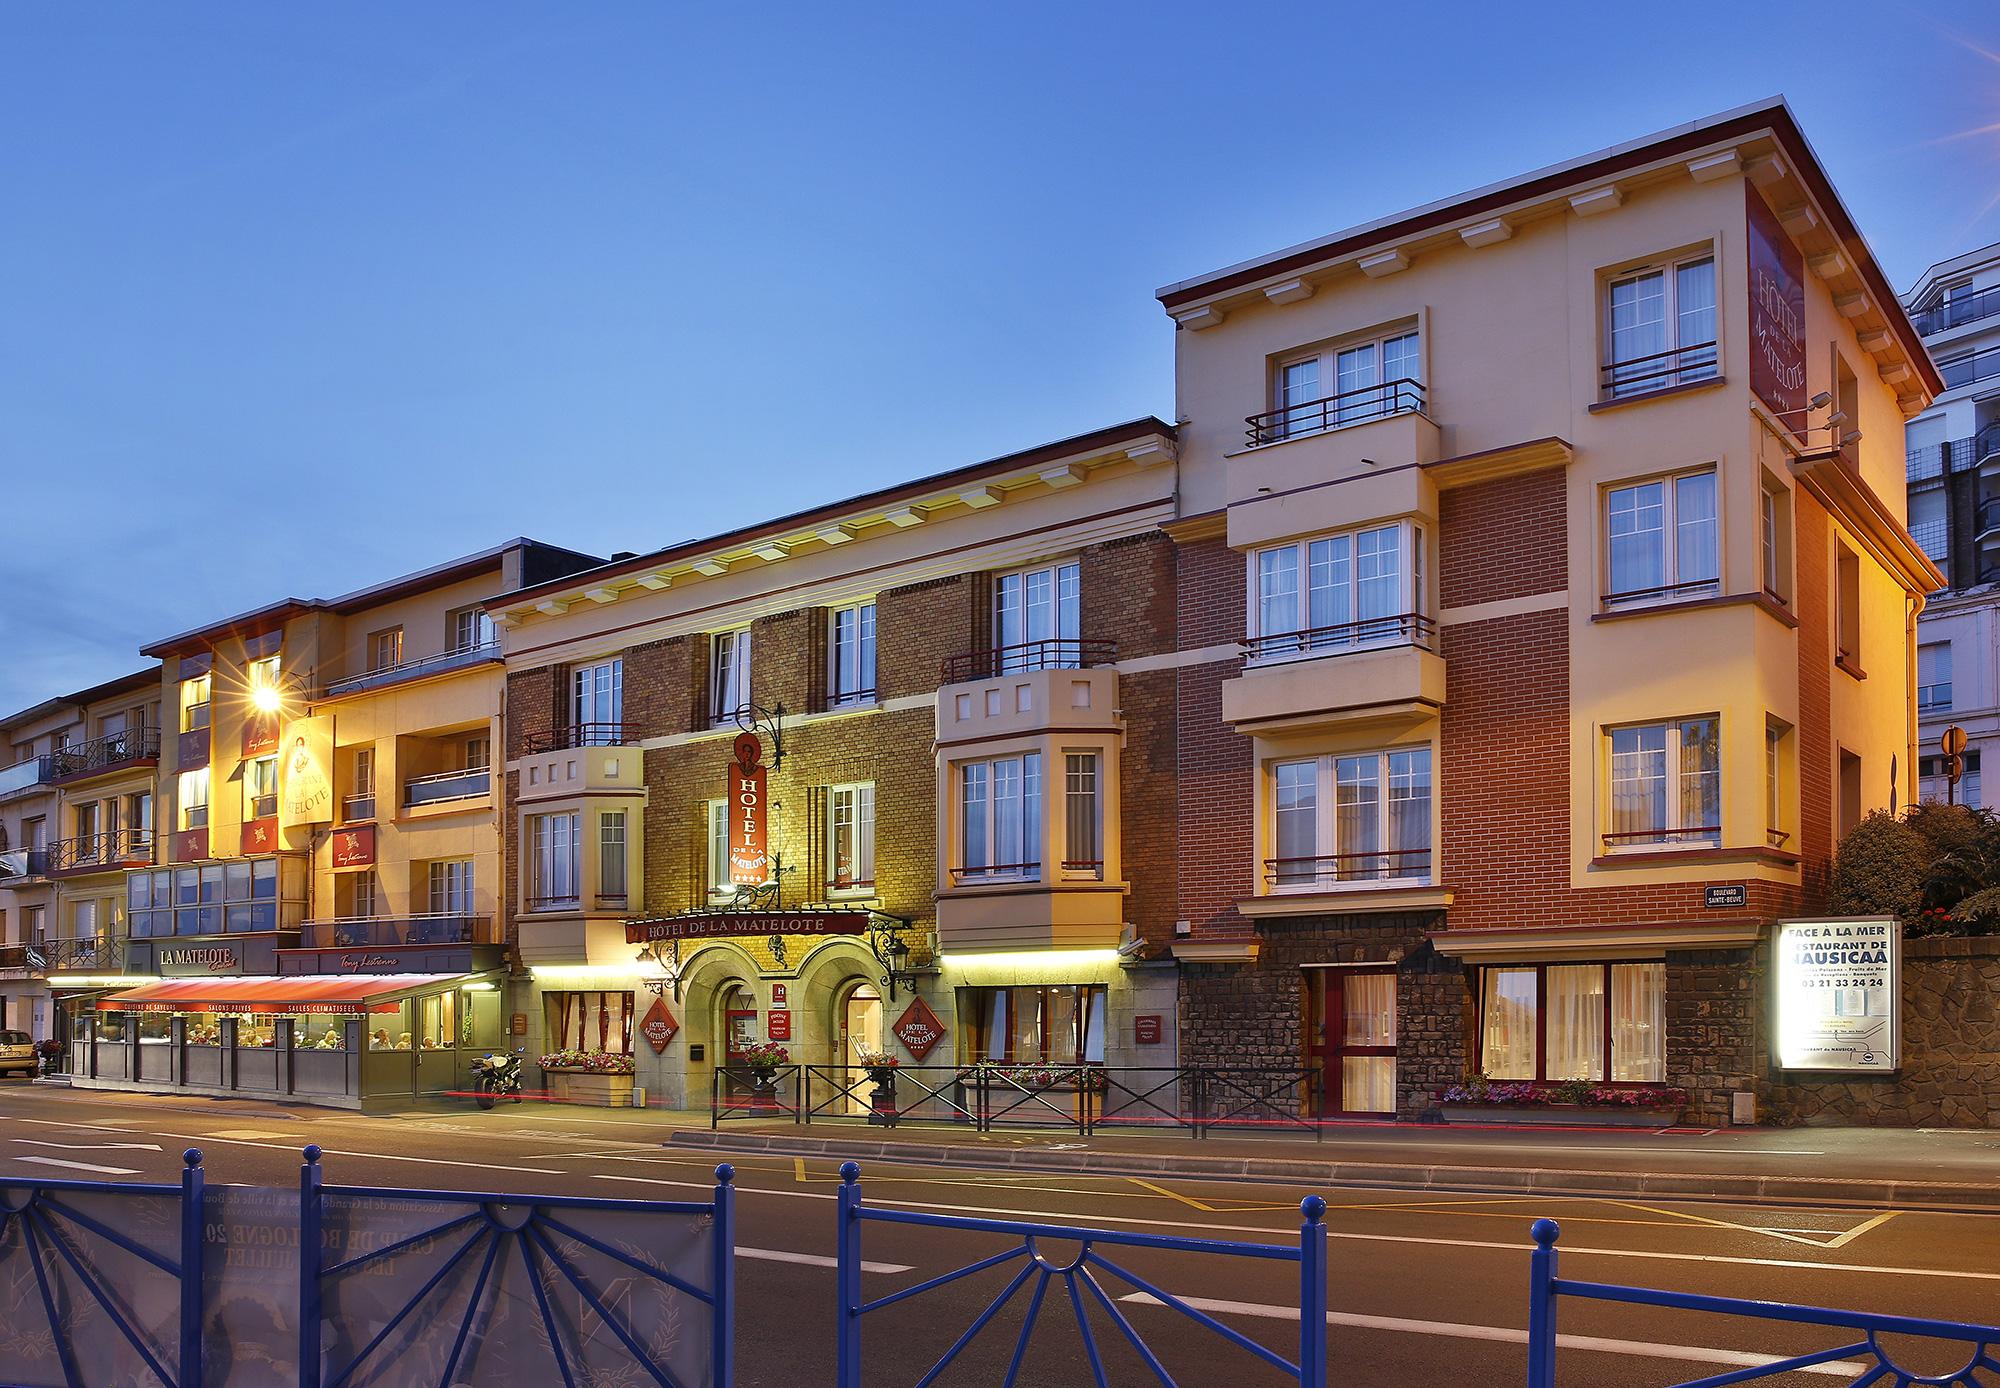 Hotel - La Matelote. Hôtel **** - Restaurant 1*Michelin